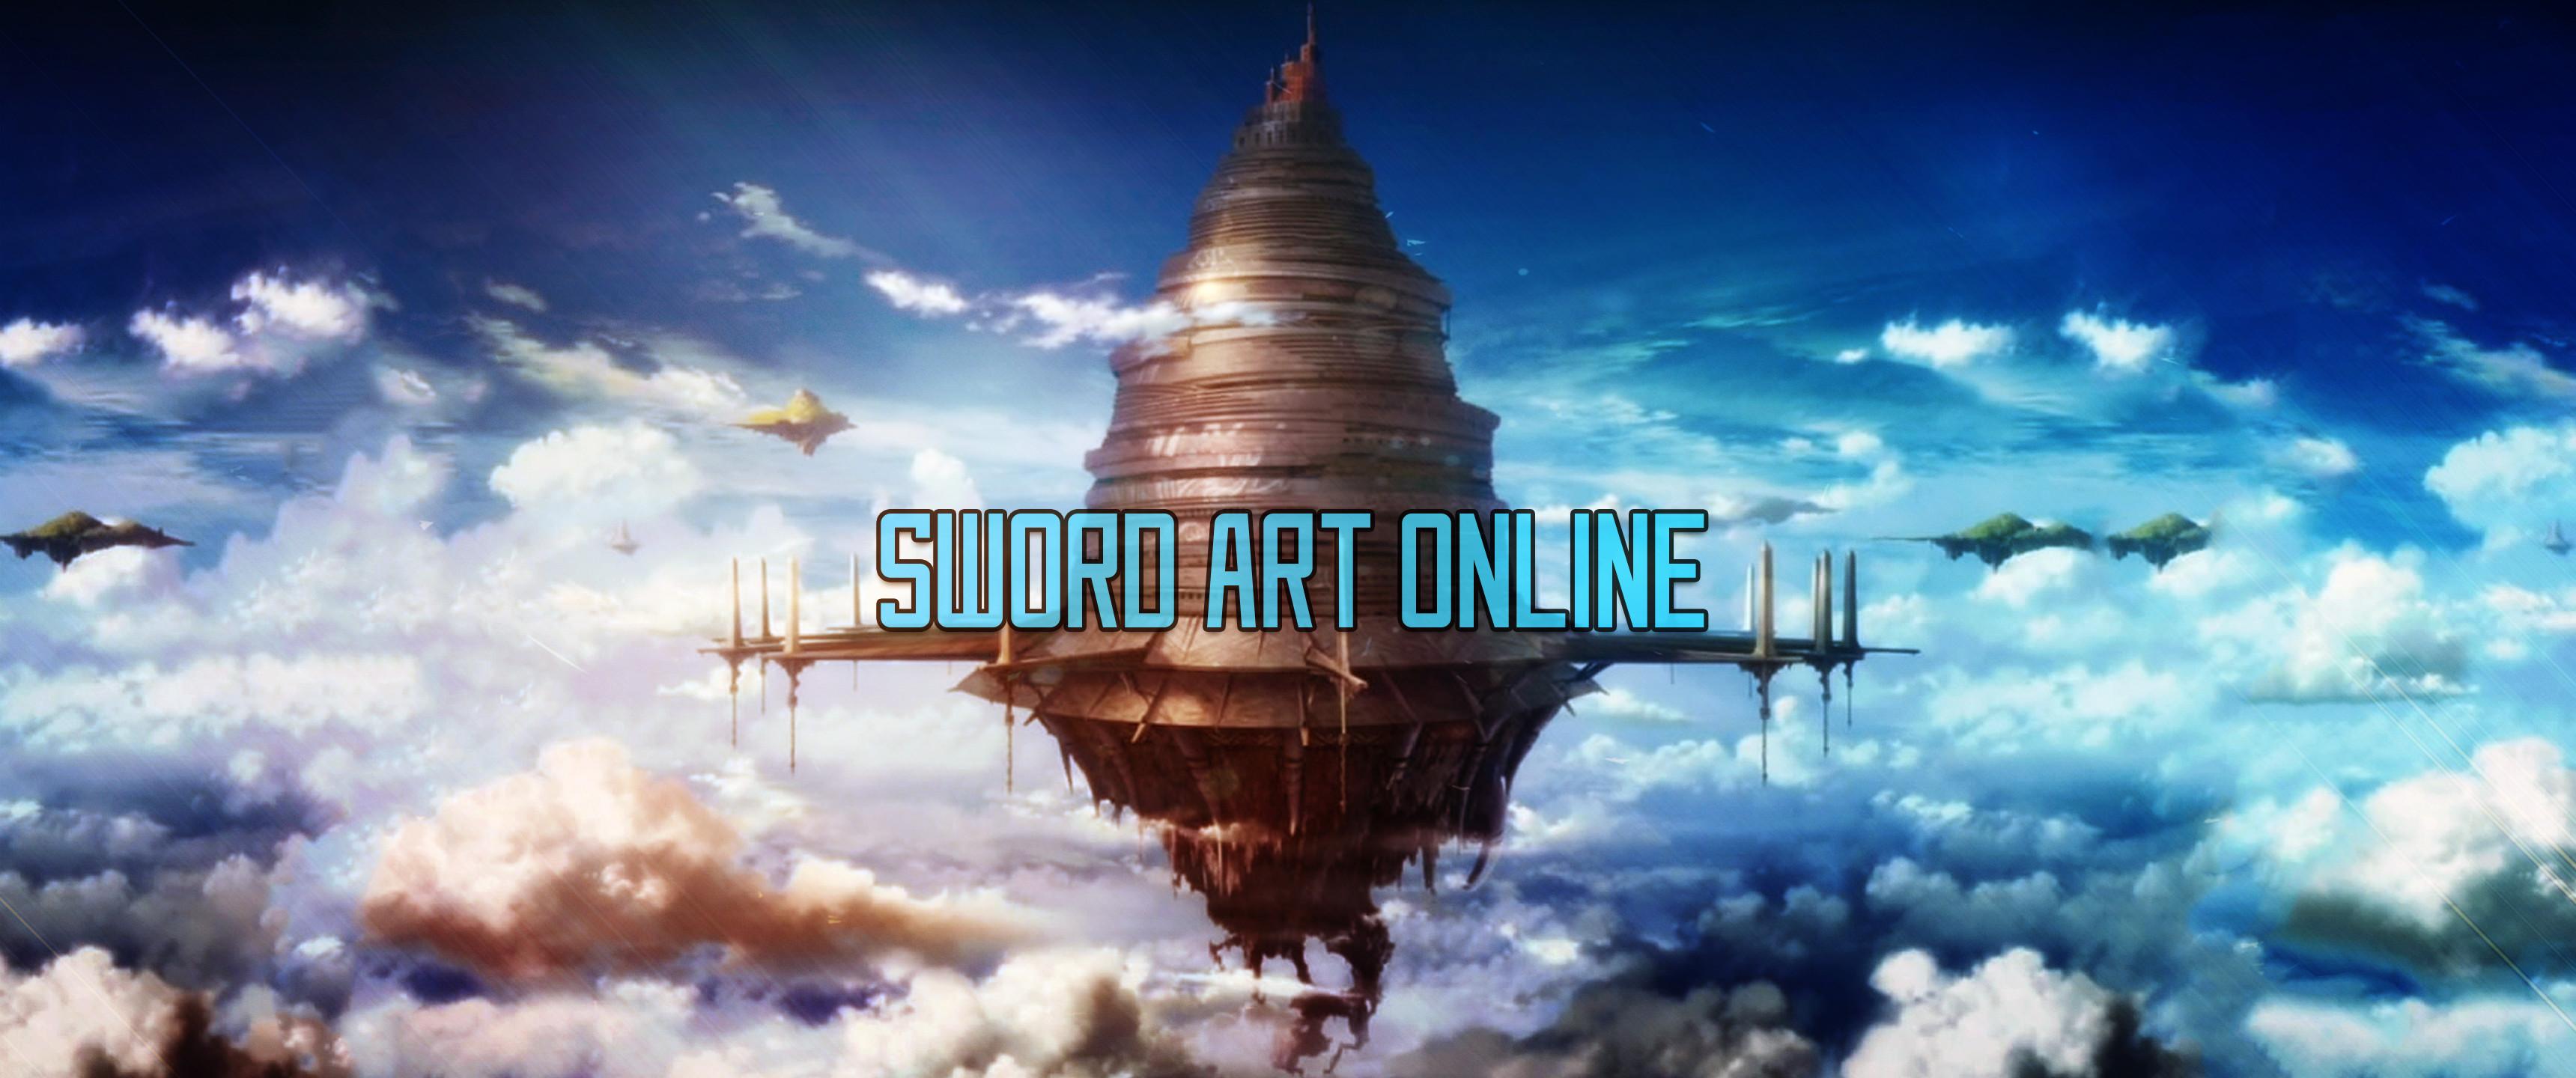 Aincrad Landscape Sword Art Online · HD Wallpaper | Background ID:672220